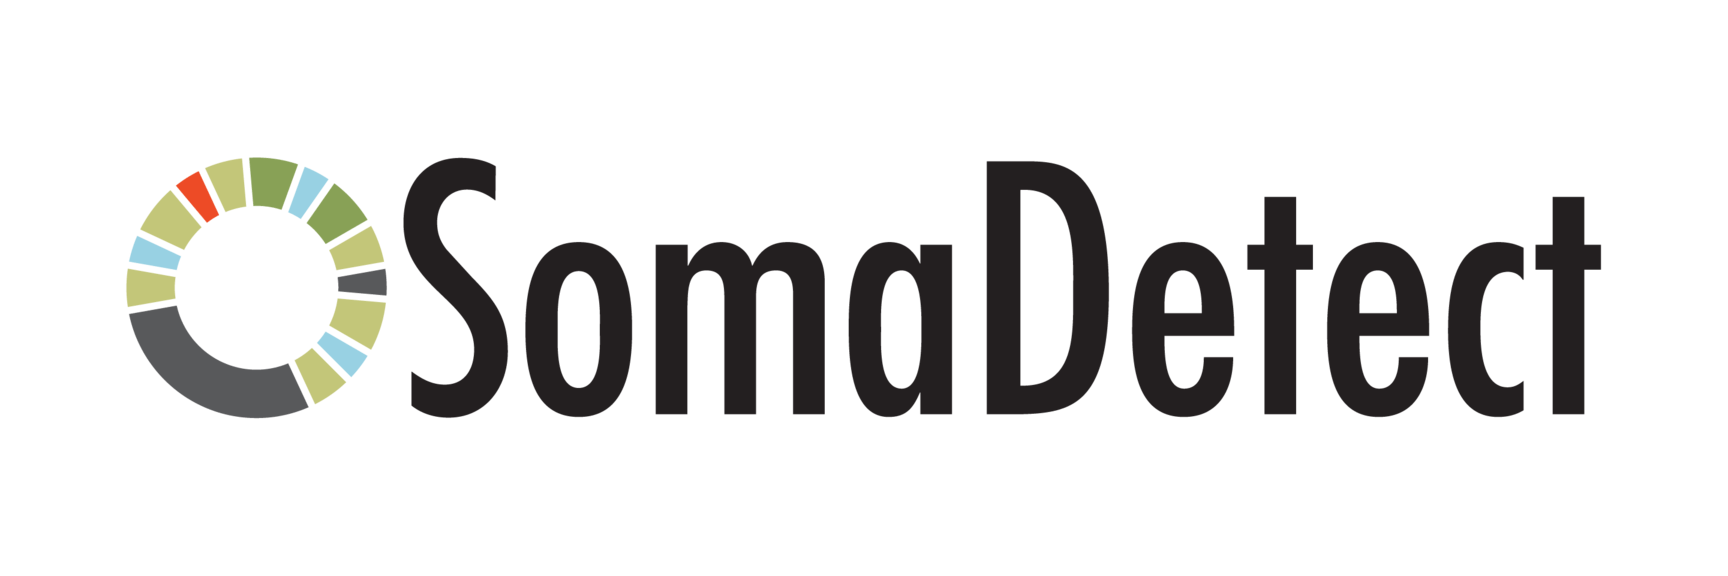 SomaDetect company logo